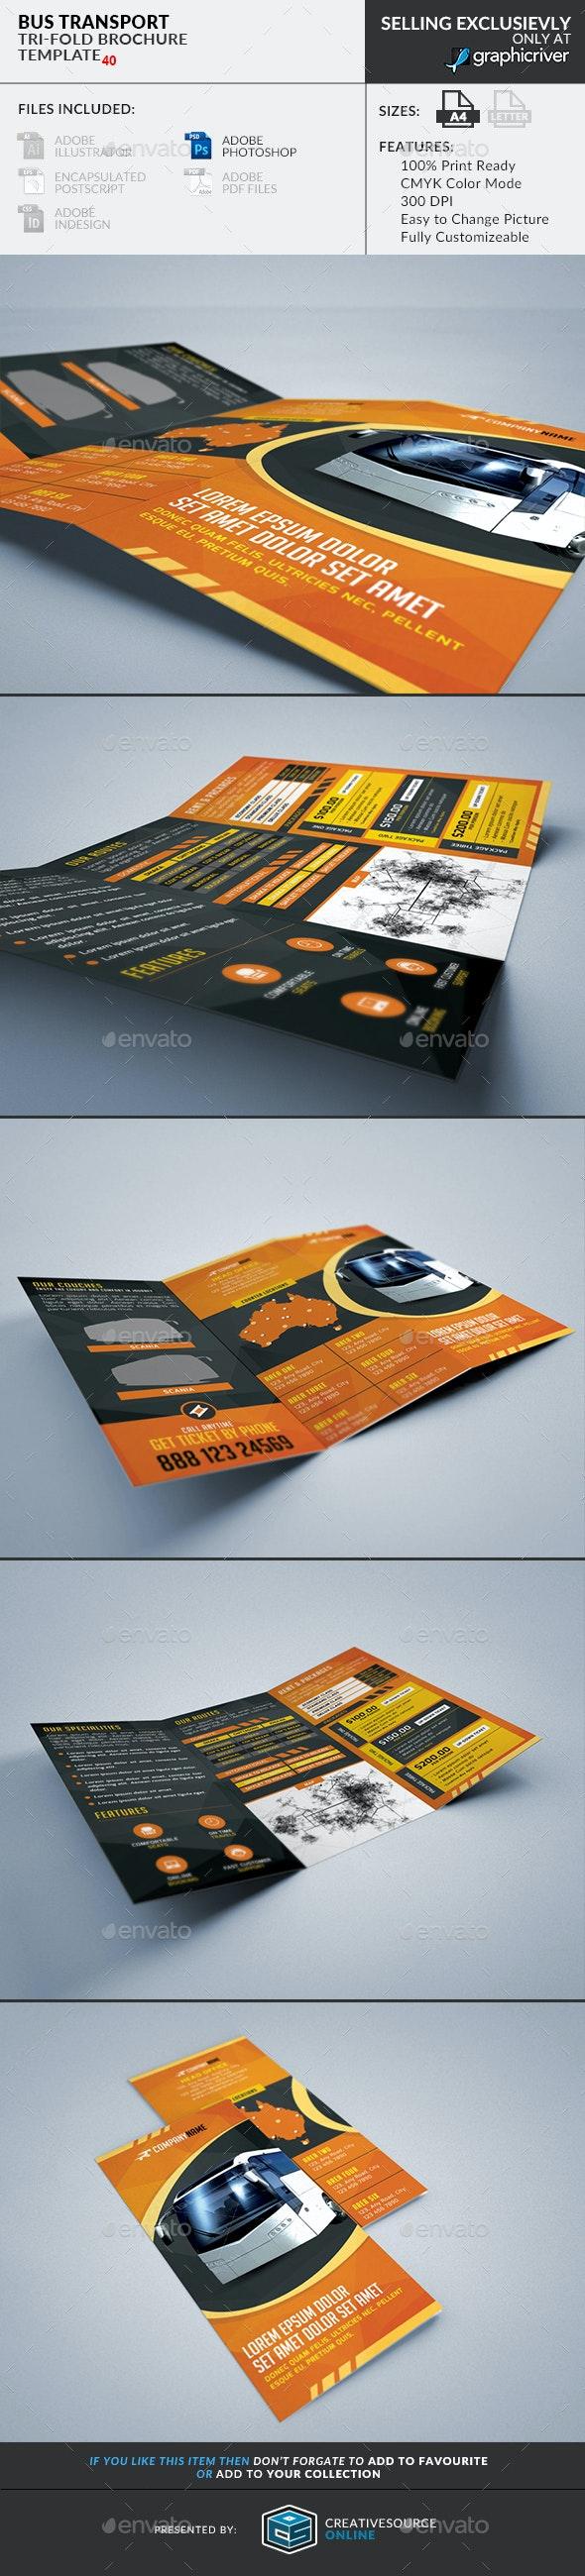 Trifold Brochure 40: Bus Transportation Agency - Corporate Brochures